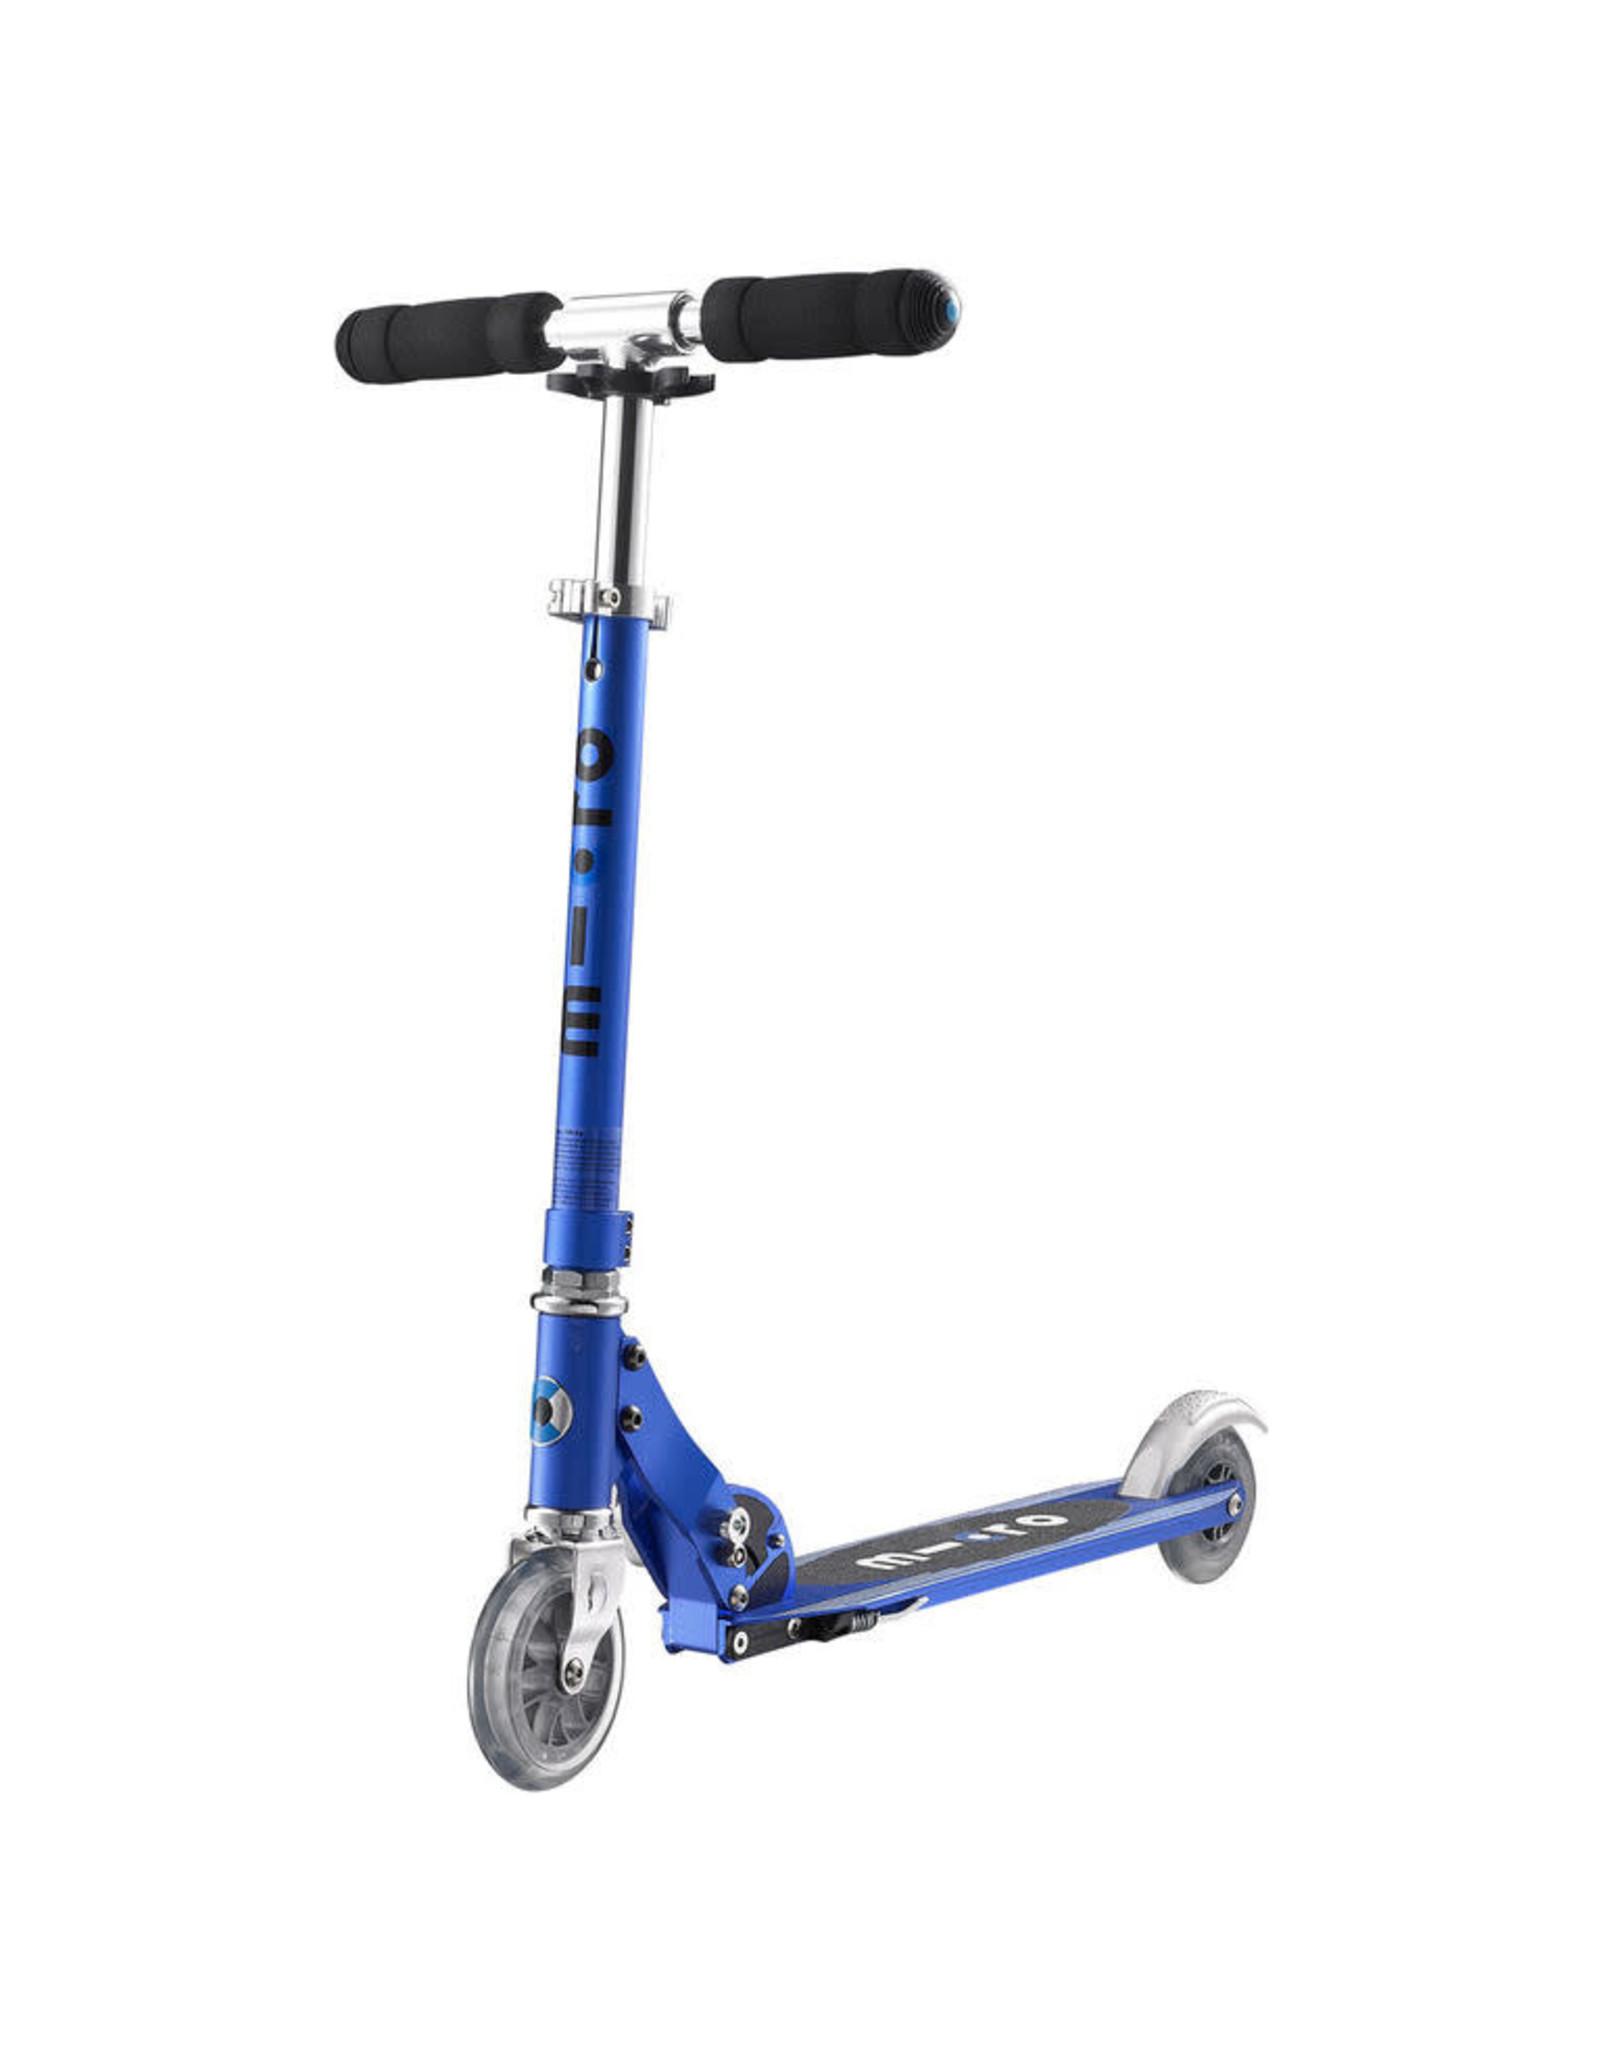 Kickboard Micro Sprite Scooter, Sapphire Blue